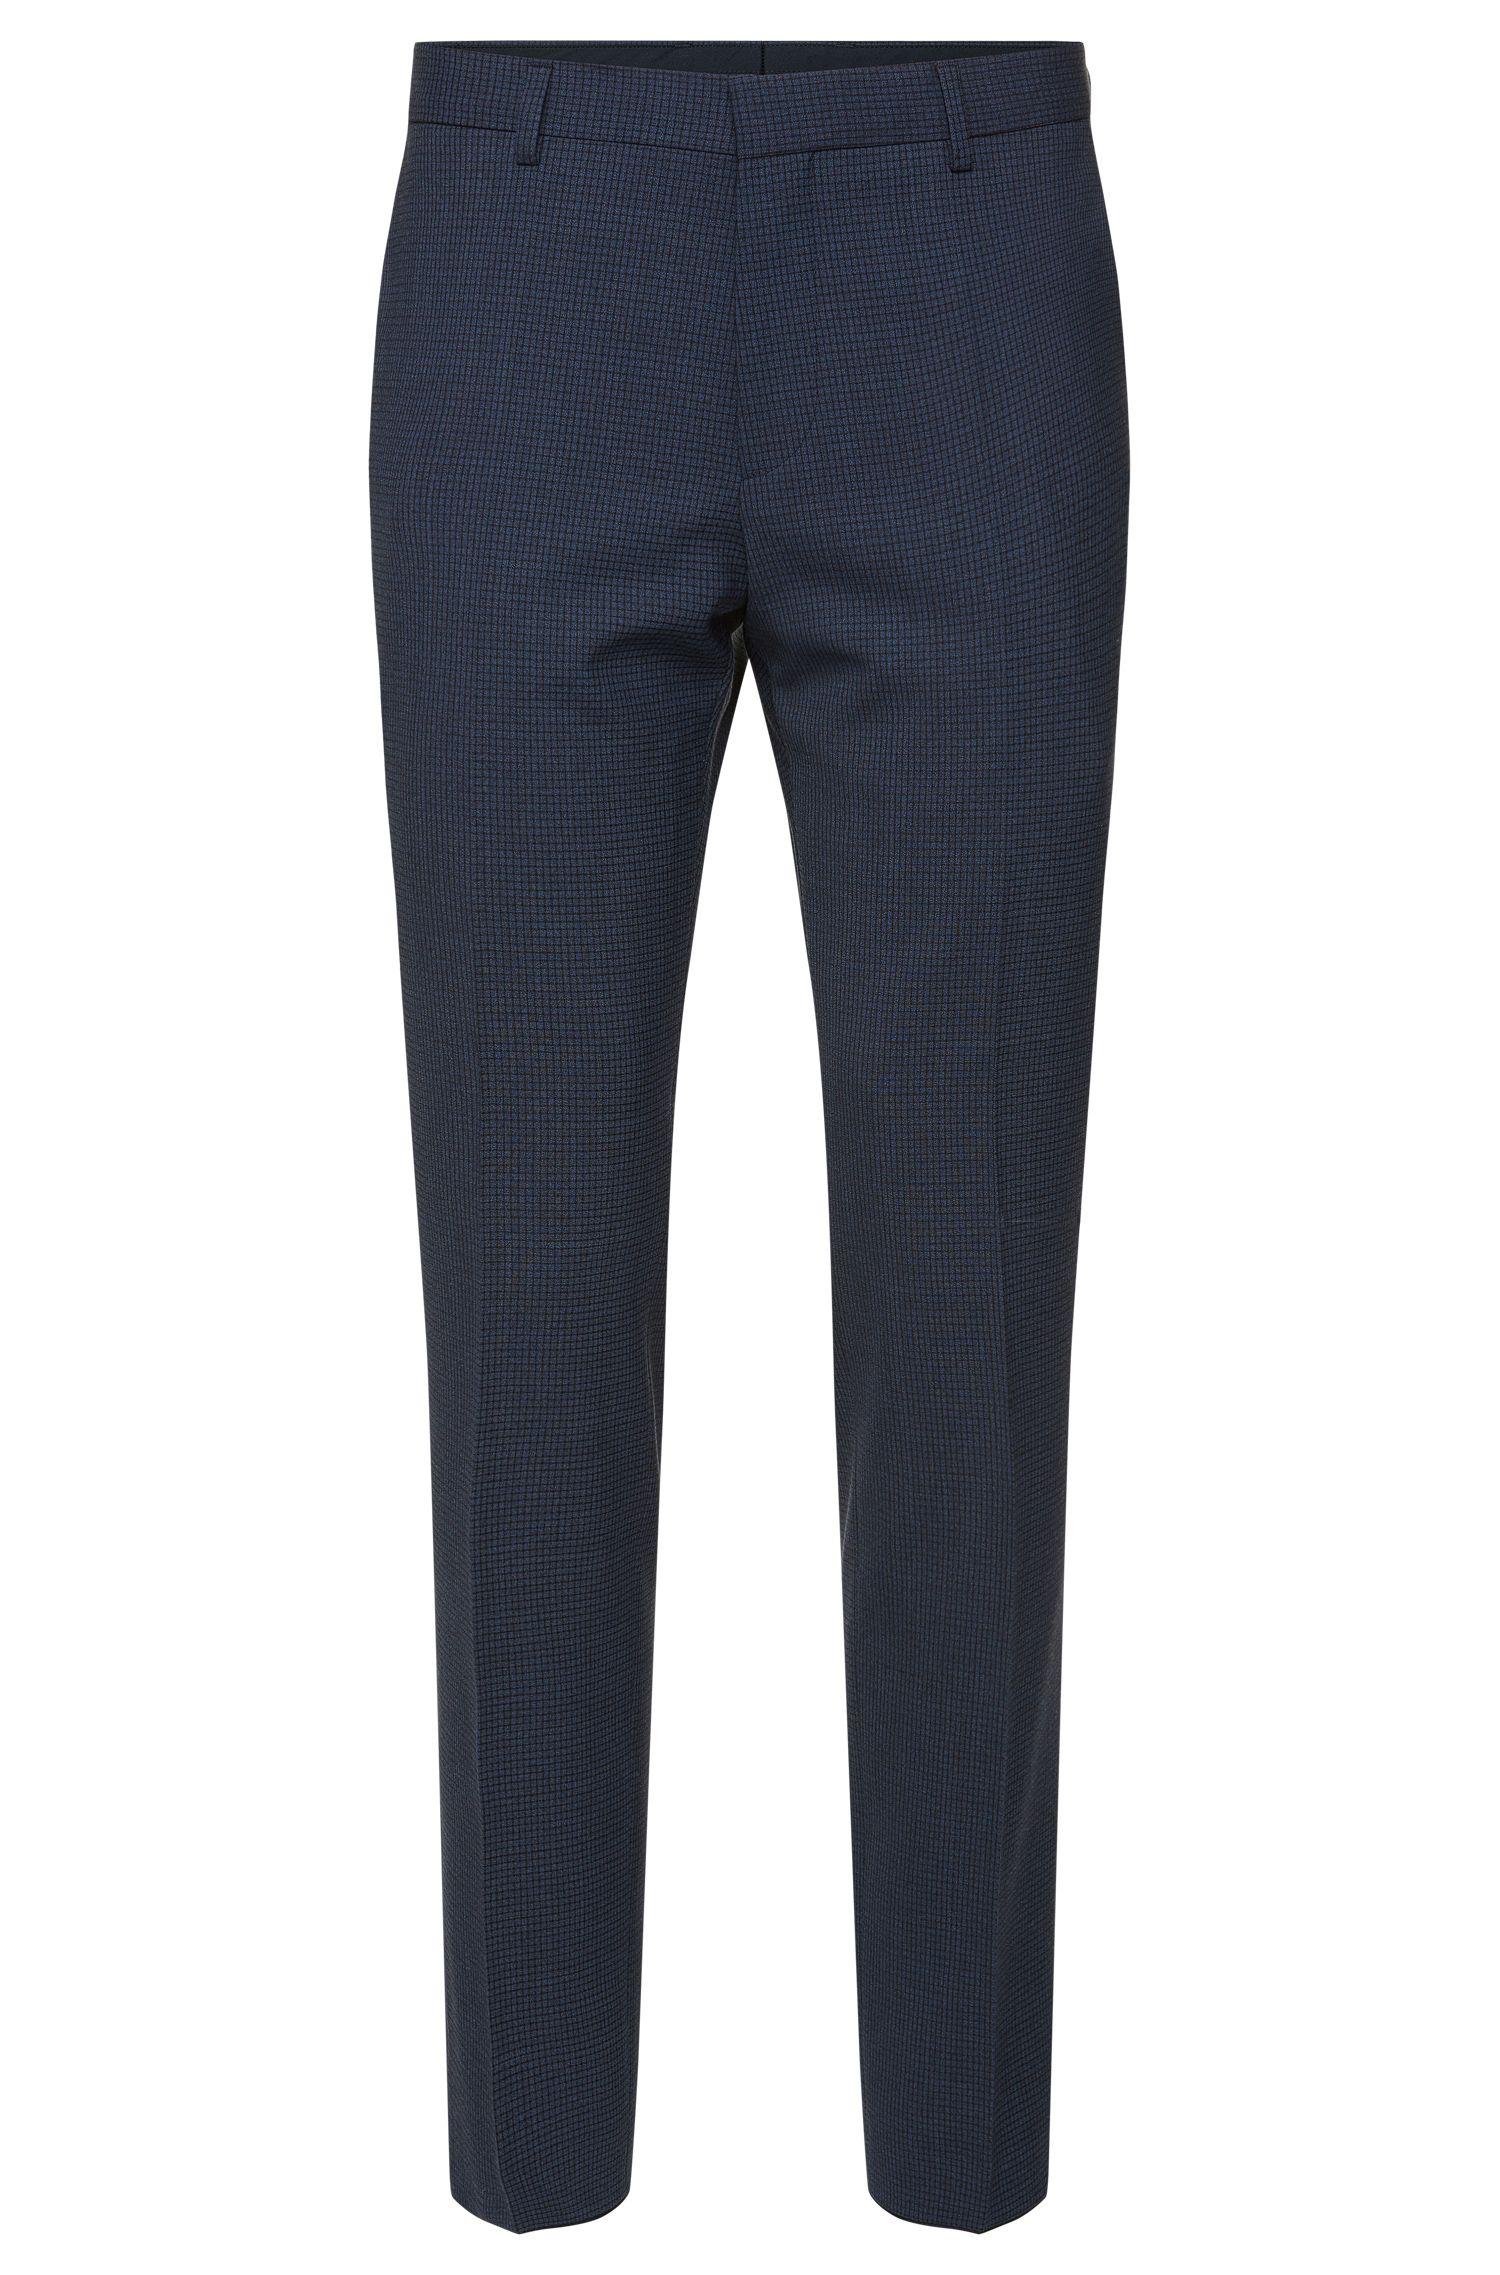 'Genesis' | Slim Fit, Stretch Wool Blend Check Dress Pants